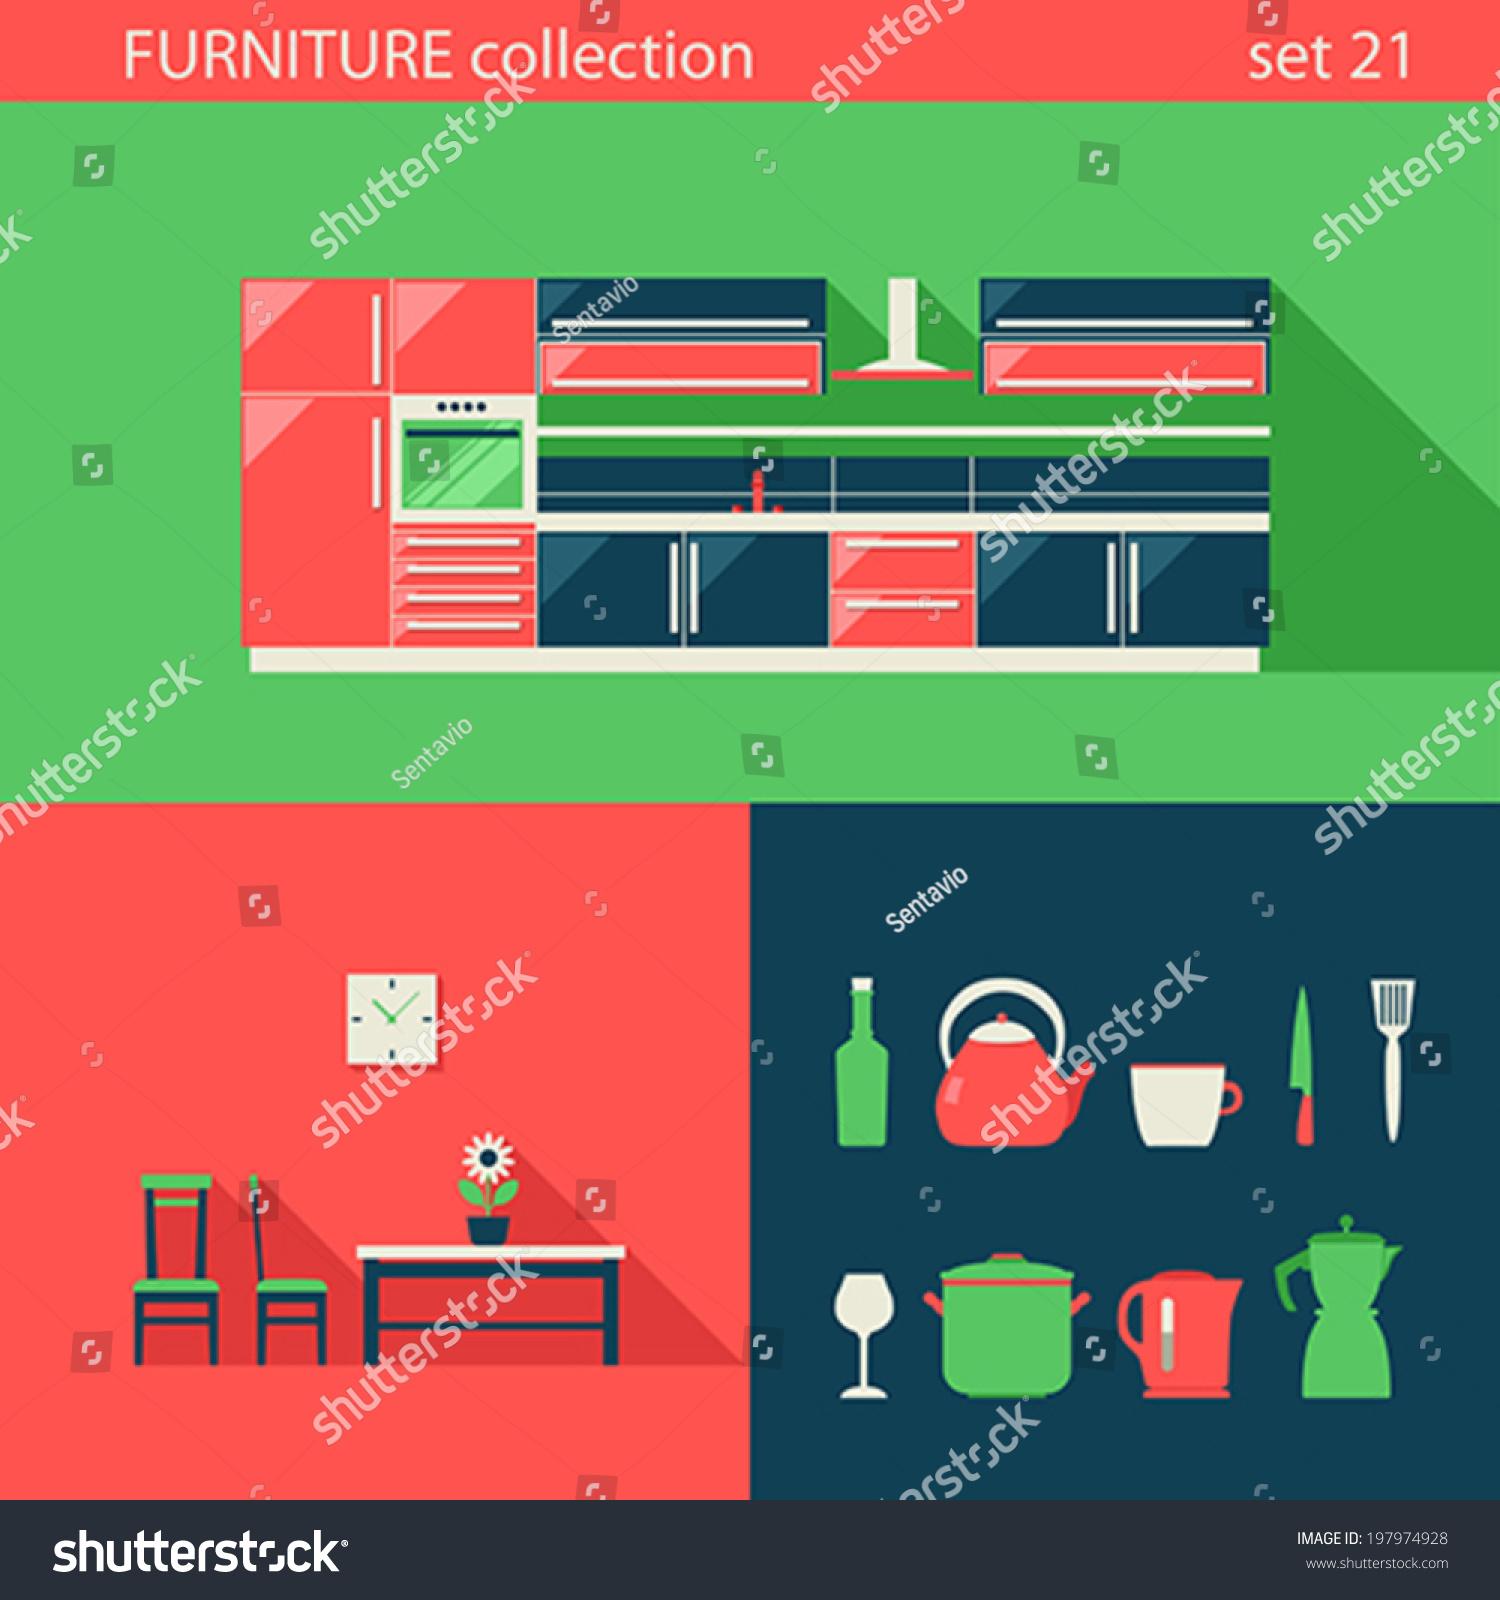 Royaltyfree Creative design flat furniture vector 197974928 Stock